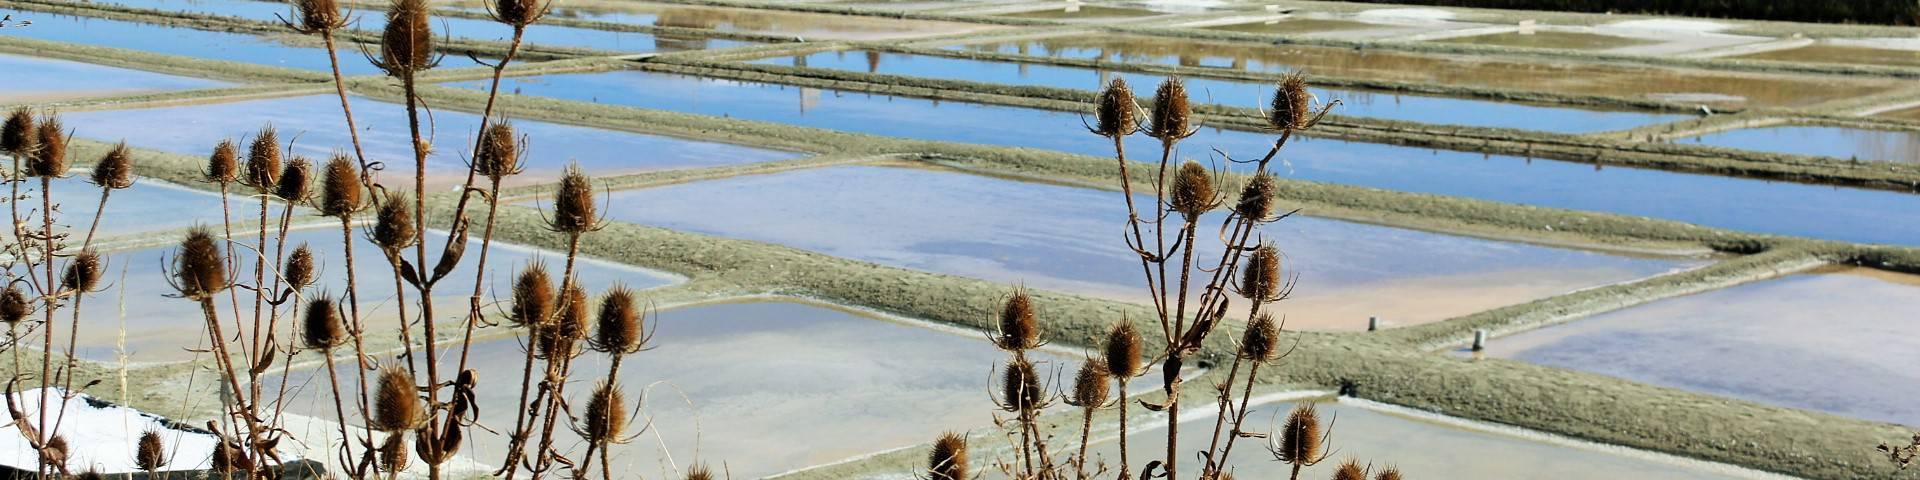 Salt marshes ©Lesley Williamson